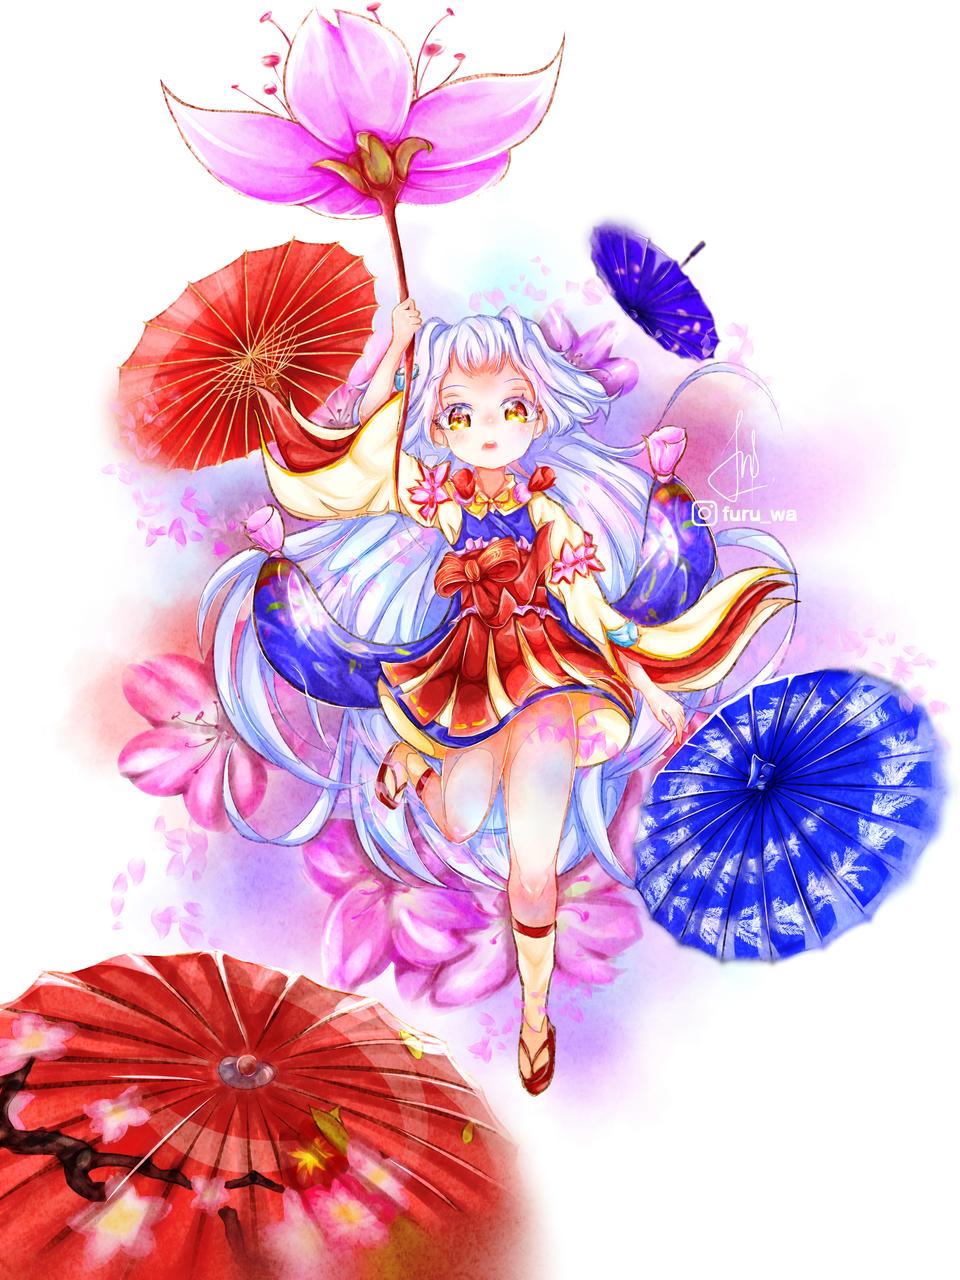 Kagura cherry blossom ( fanart ) Illust of Furuwa Kyoto_Award2020_illustration sakura iPad_raffle medibangpaint kimono kawaii anime girl Mobilelegends